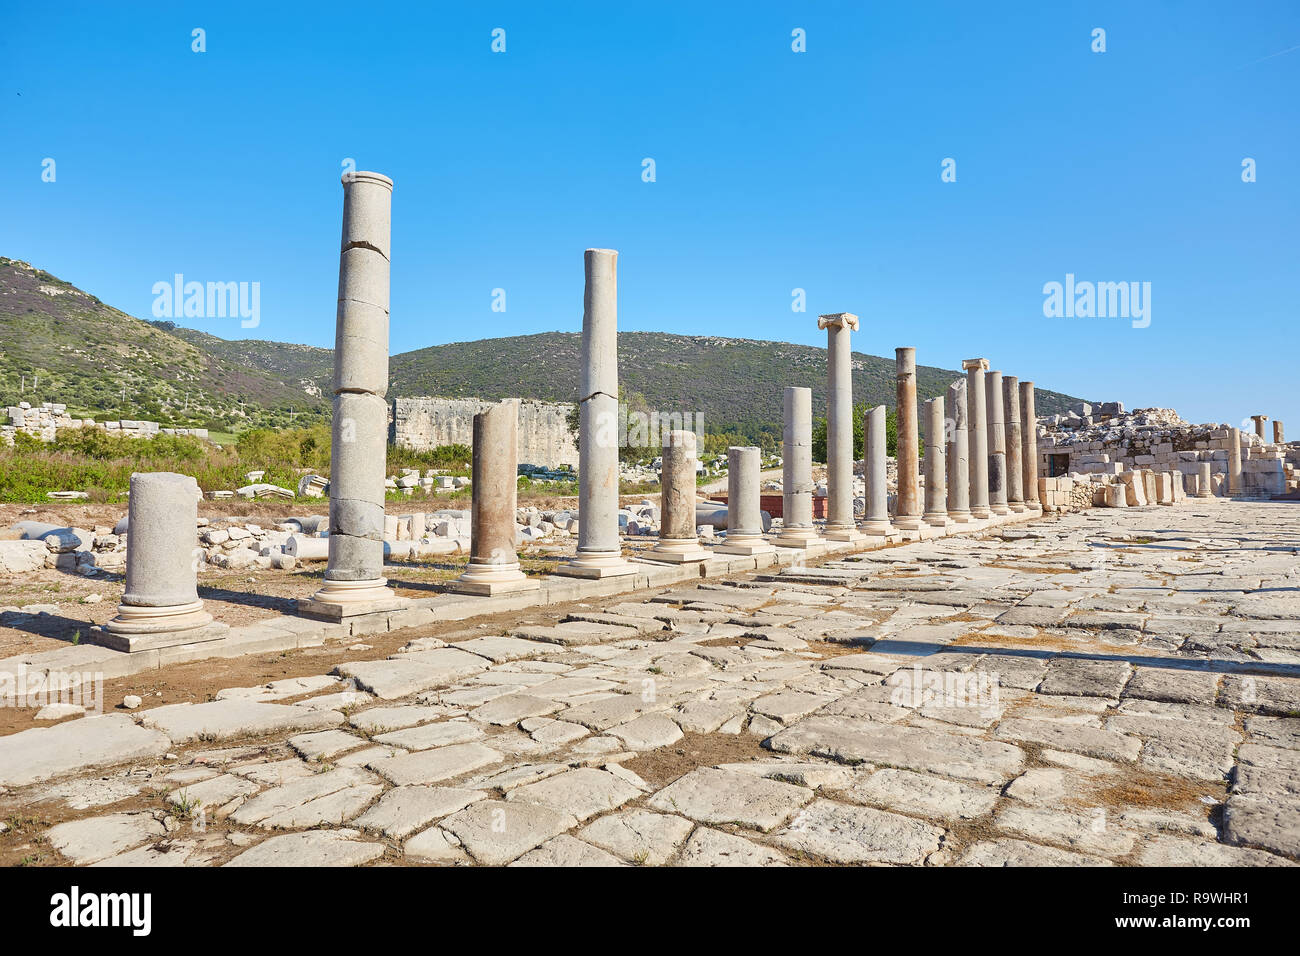 Colonnaded street, ruins of ancient Patara, Antalya Province, Turkey - Stock Image